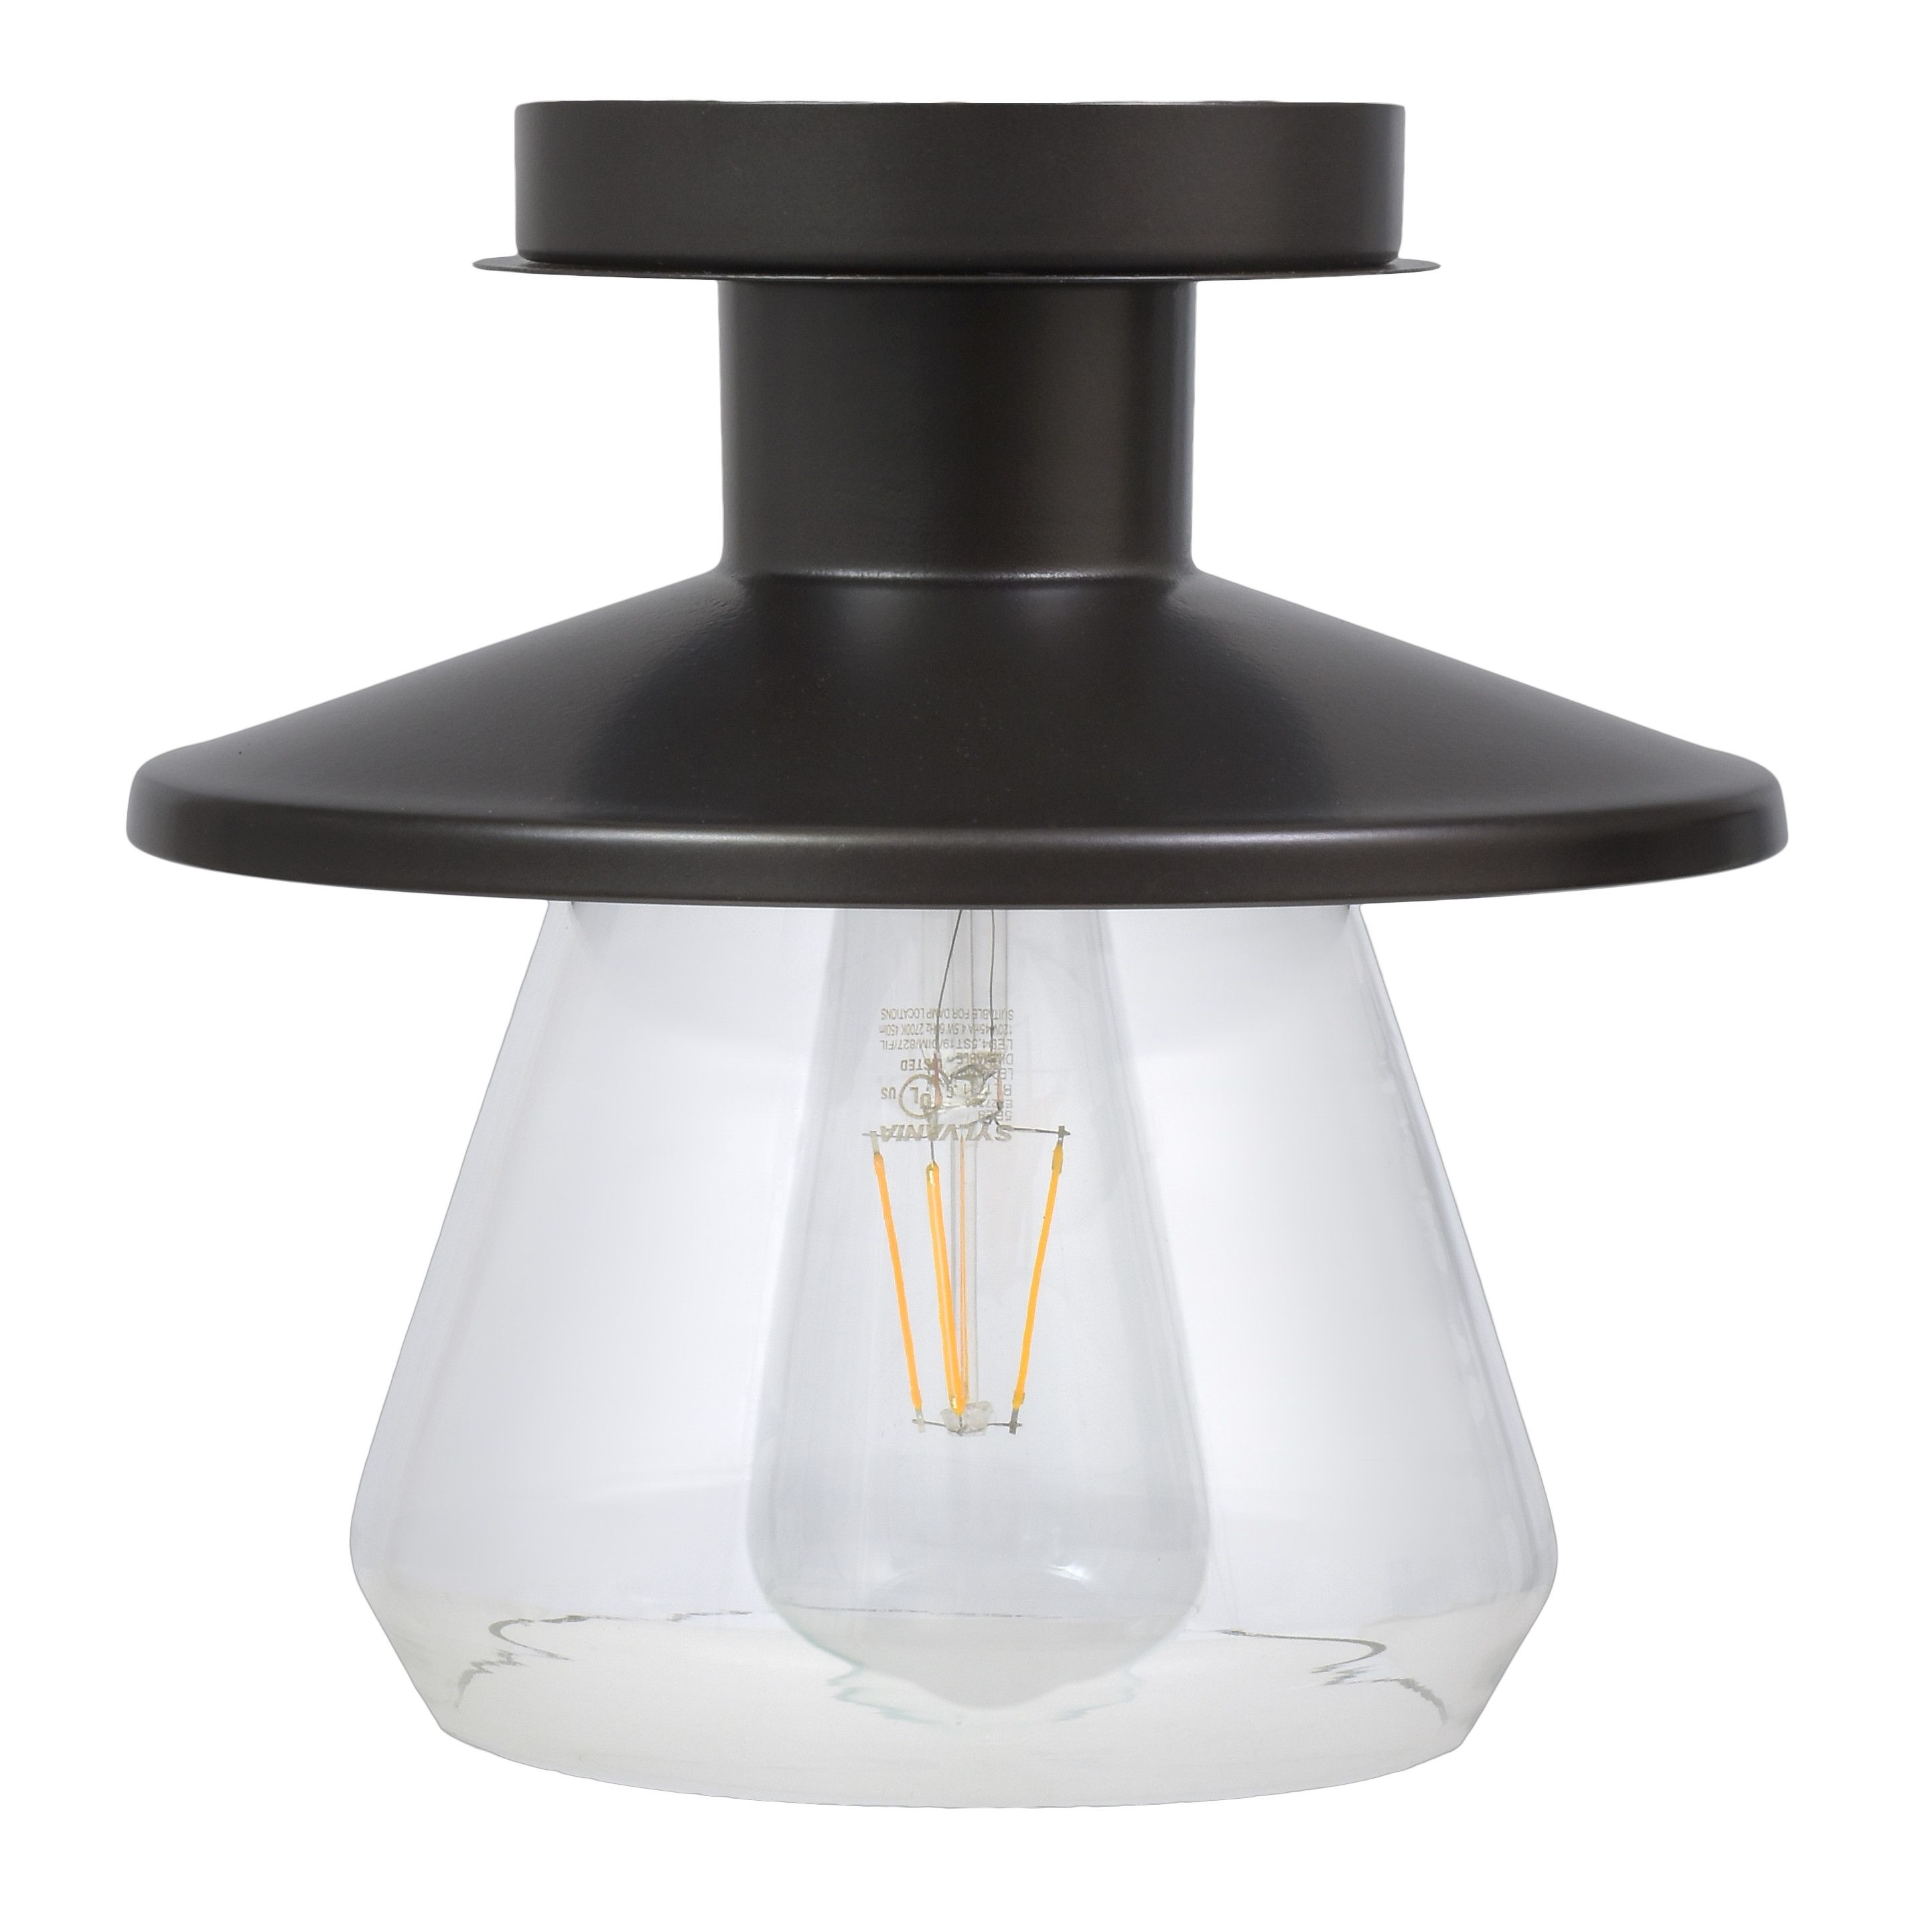 Lighting For Recreational Room Or Basement Indoor Lighting Affordable Home Decor Led Light Bulb Black Ceiling Light Fixtures Flush Mount